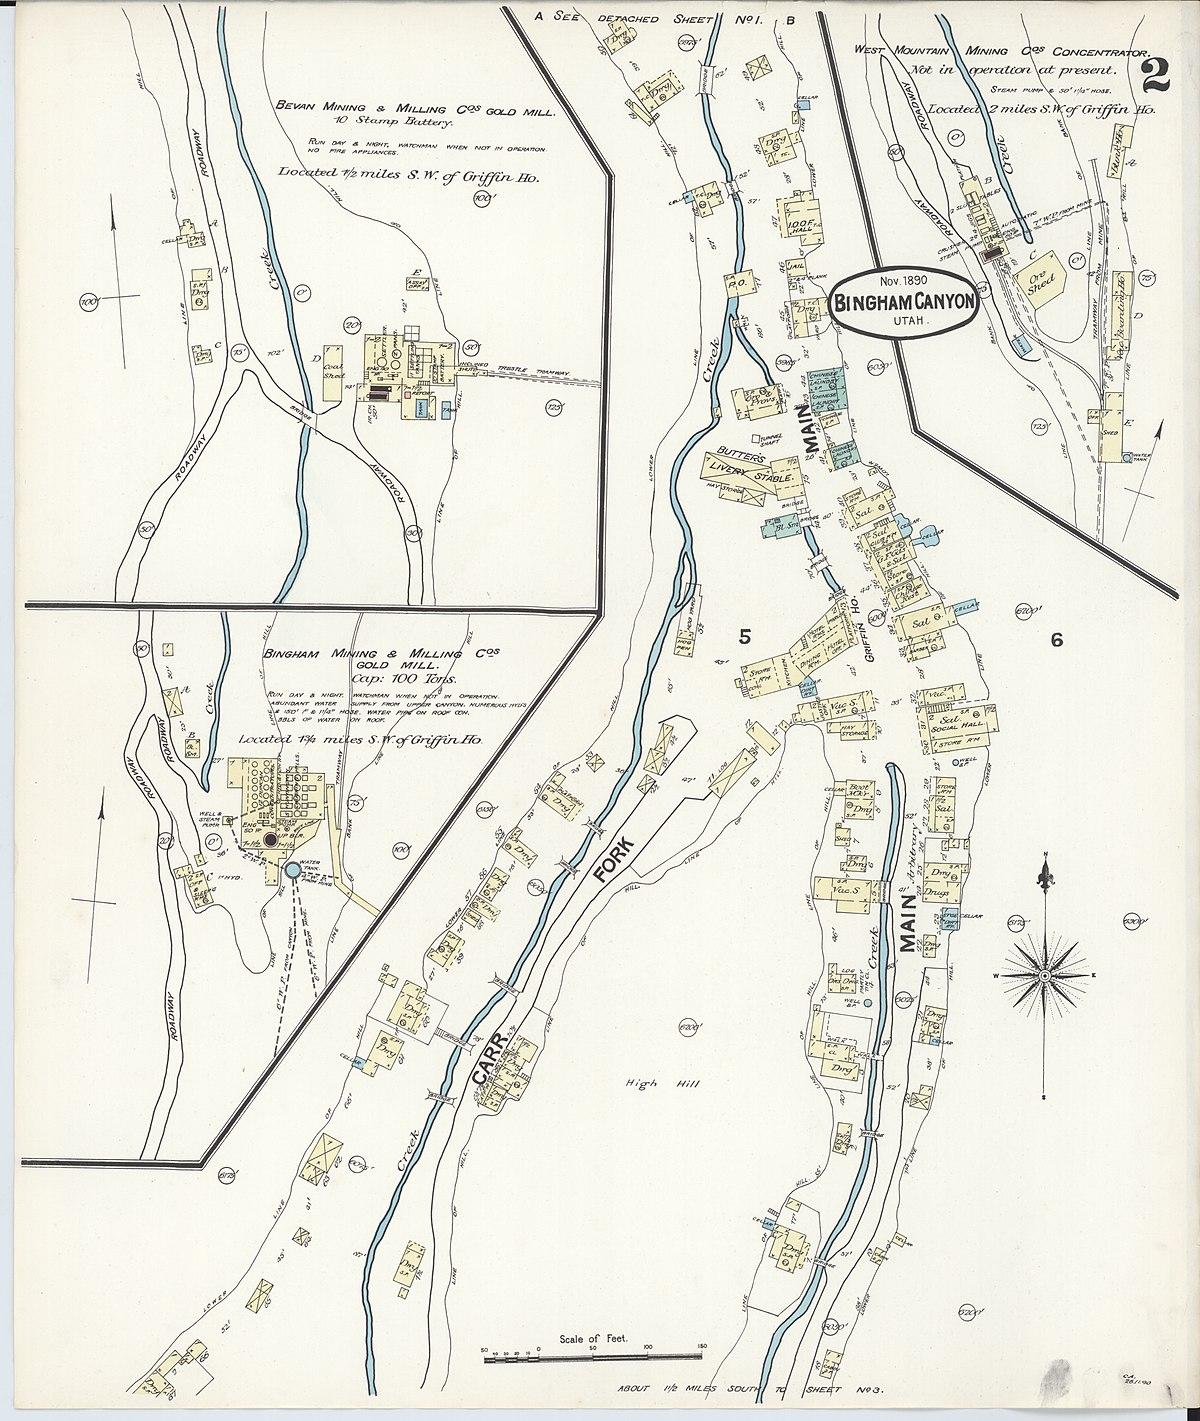 File:Sanborn Fire Insurance Map From Bingham Canyon, Salt